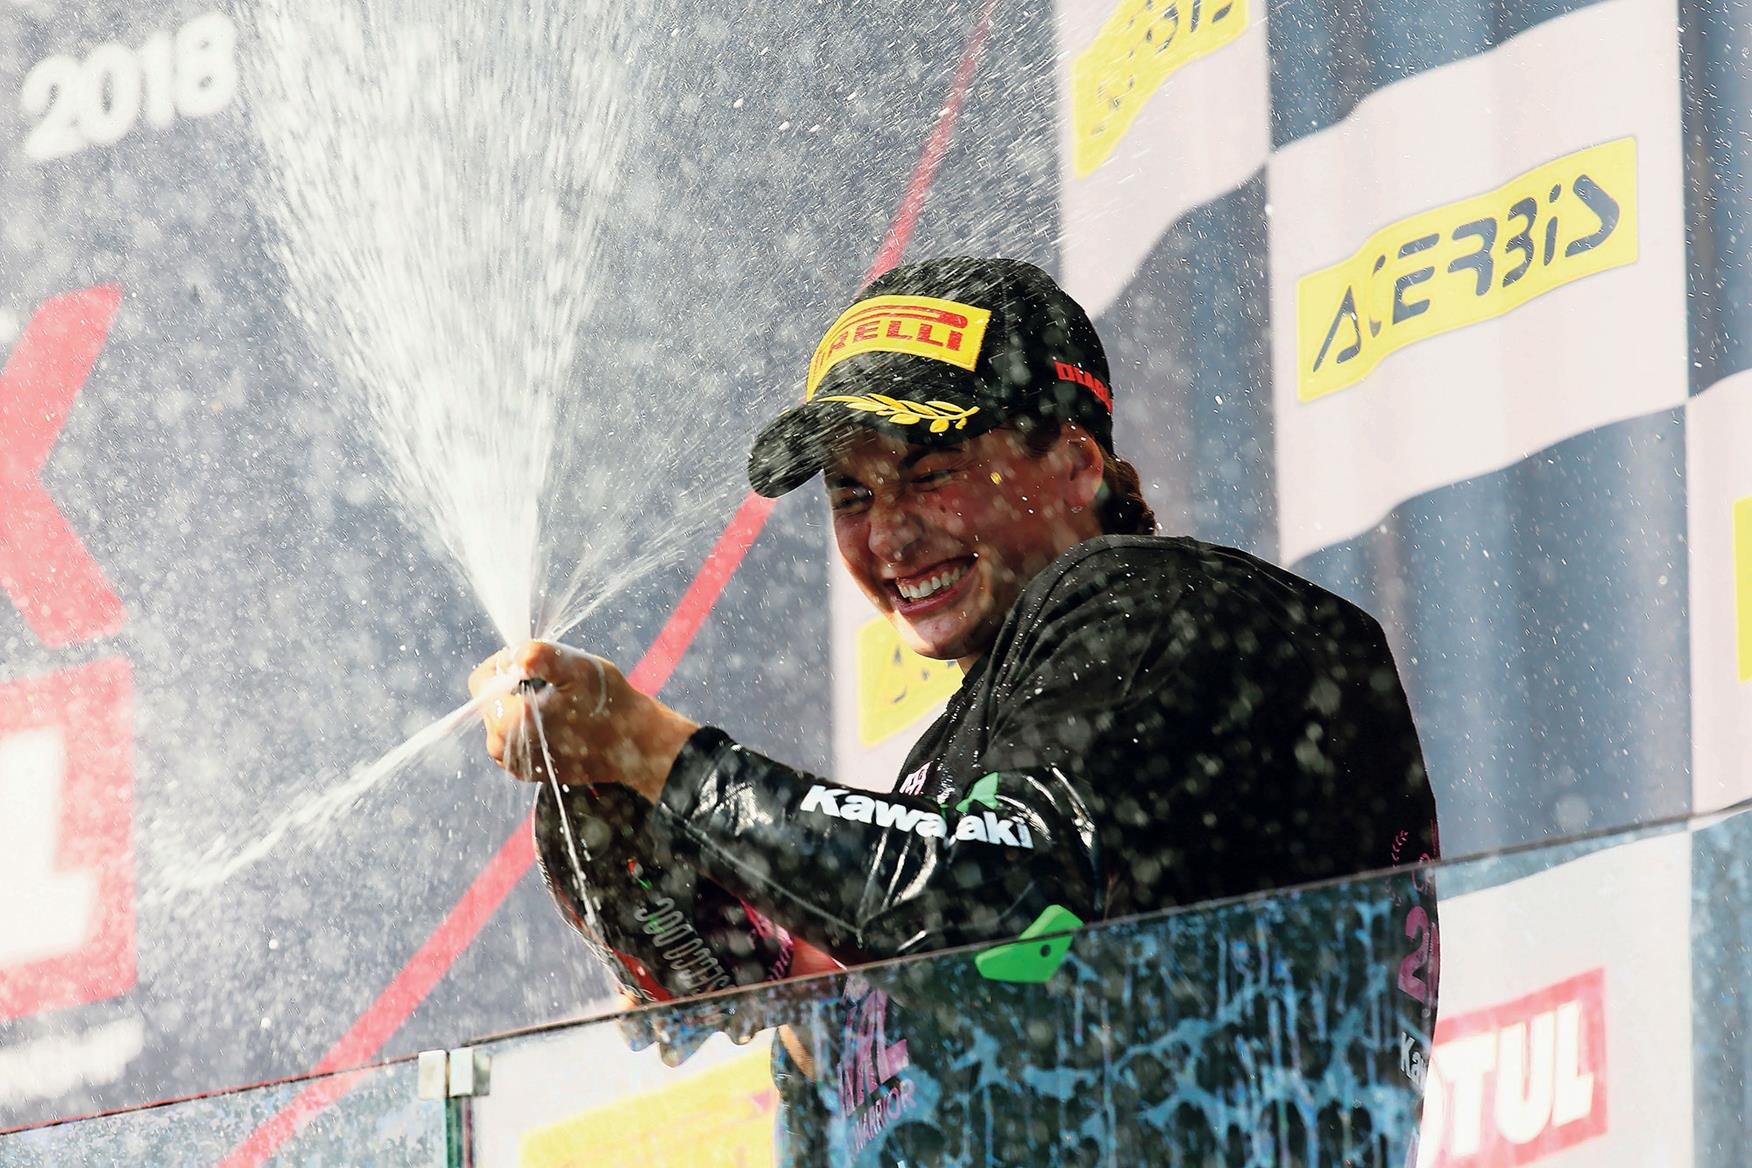 Ana Carrasco becomes first female world champion